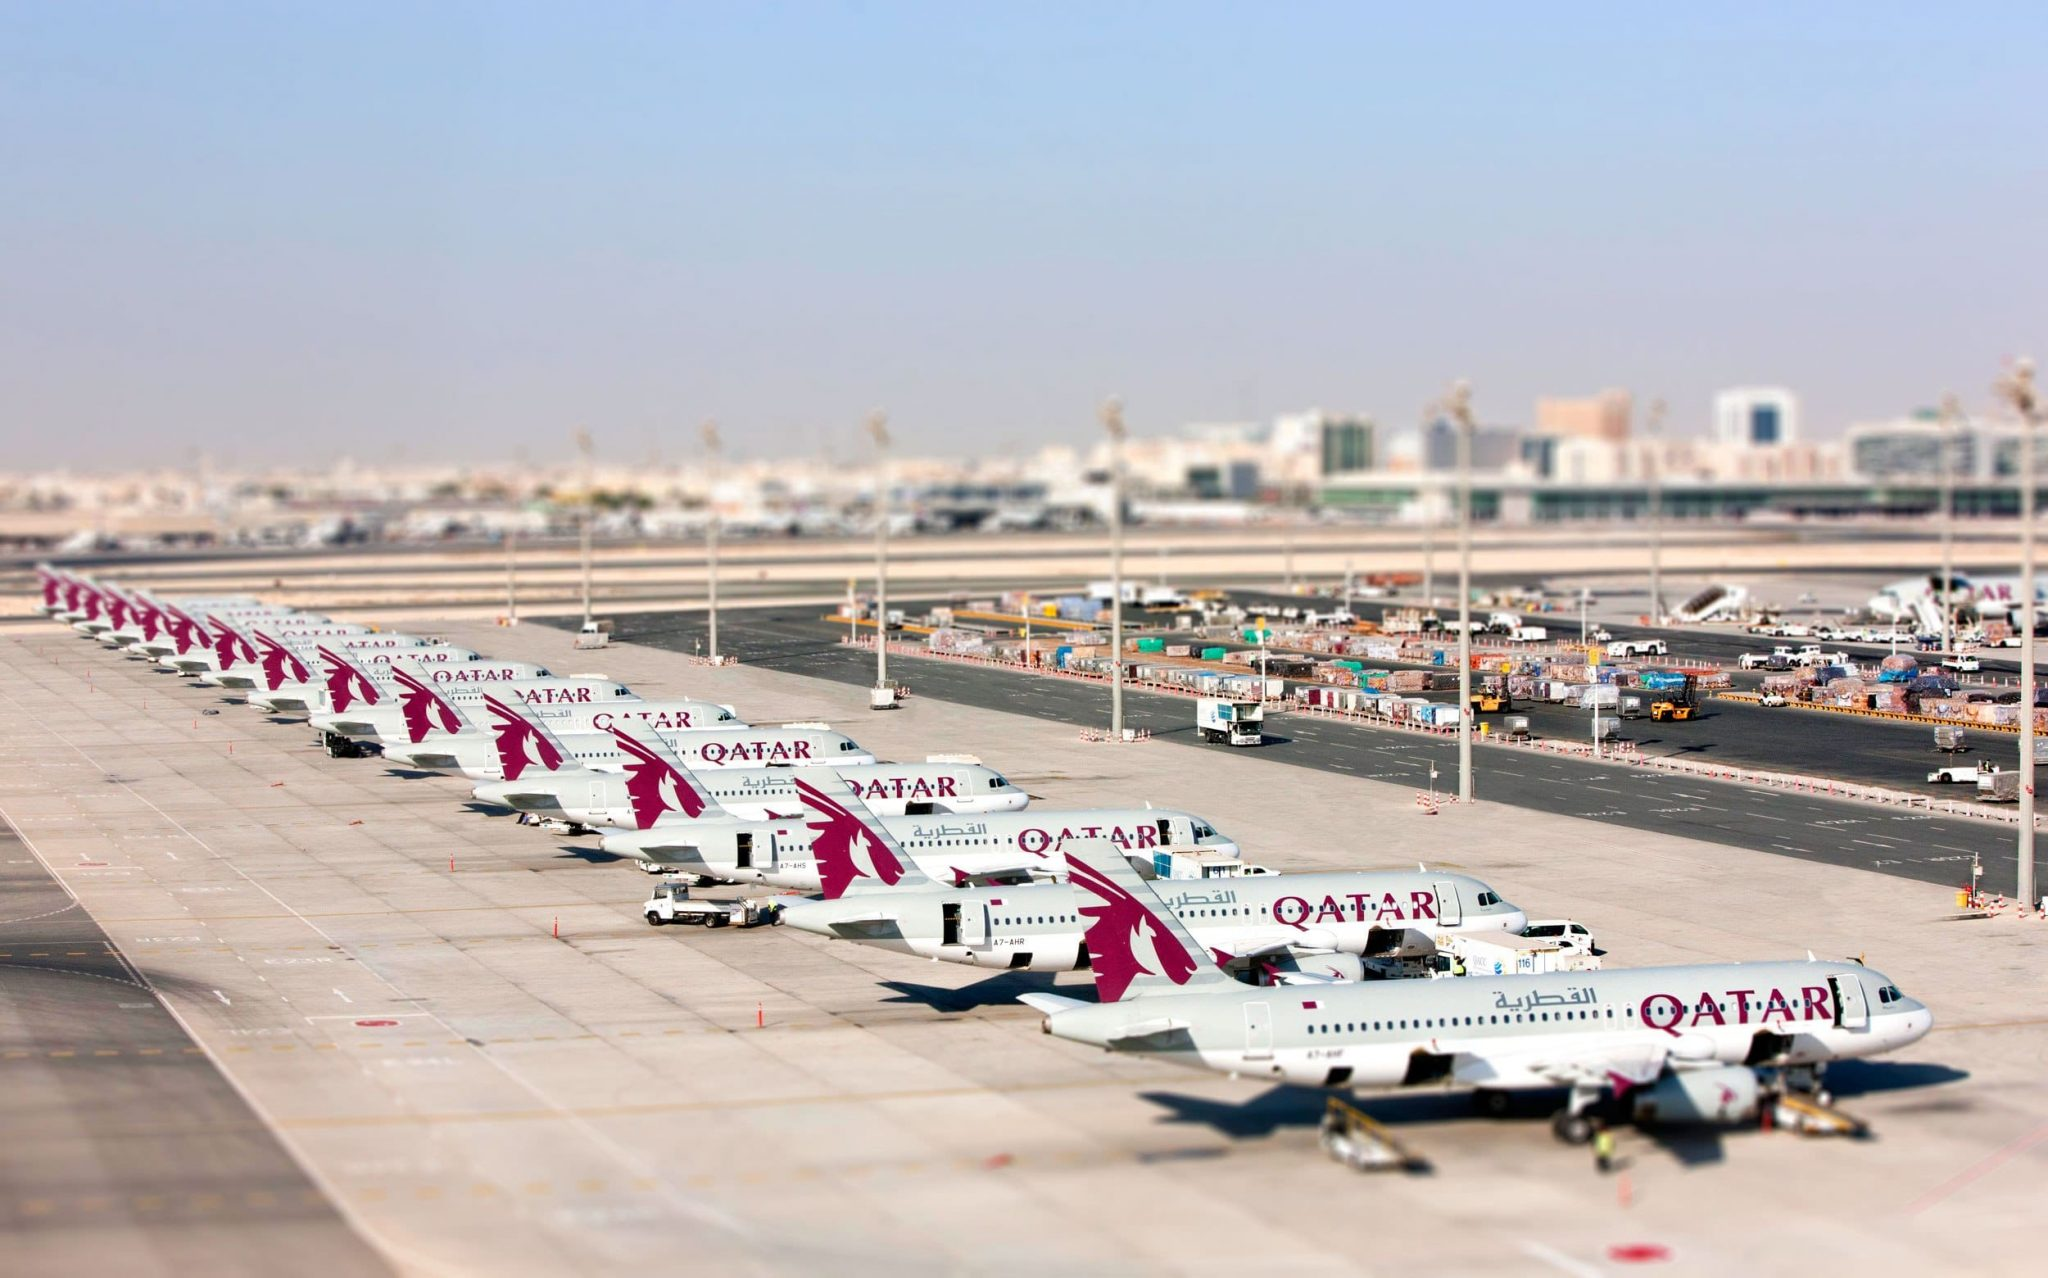 Qatar airways to display airbus a350 a320 and 787 at farnborough